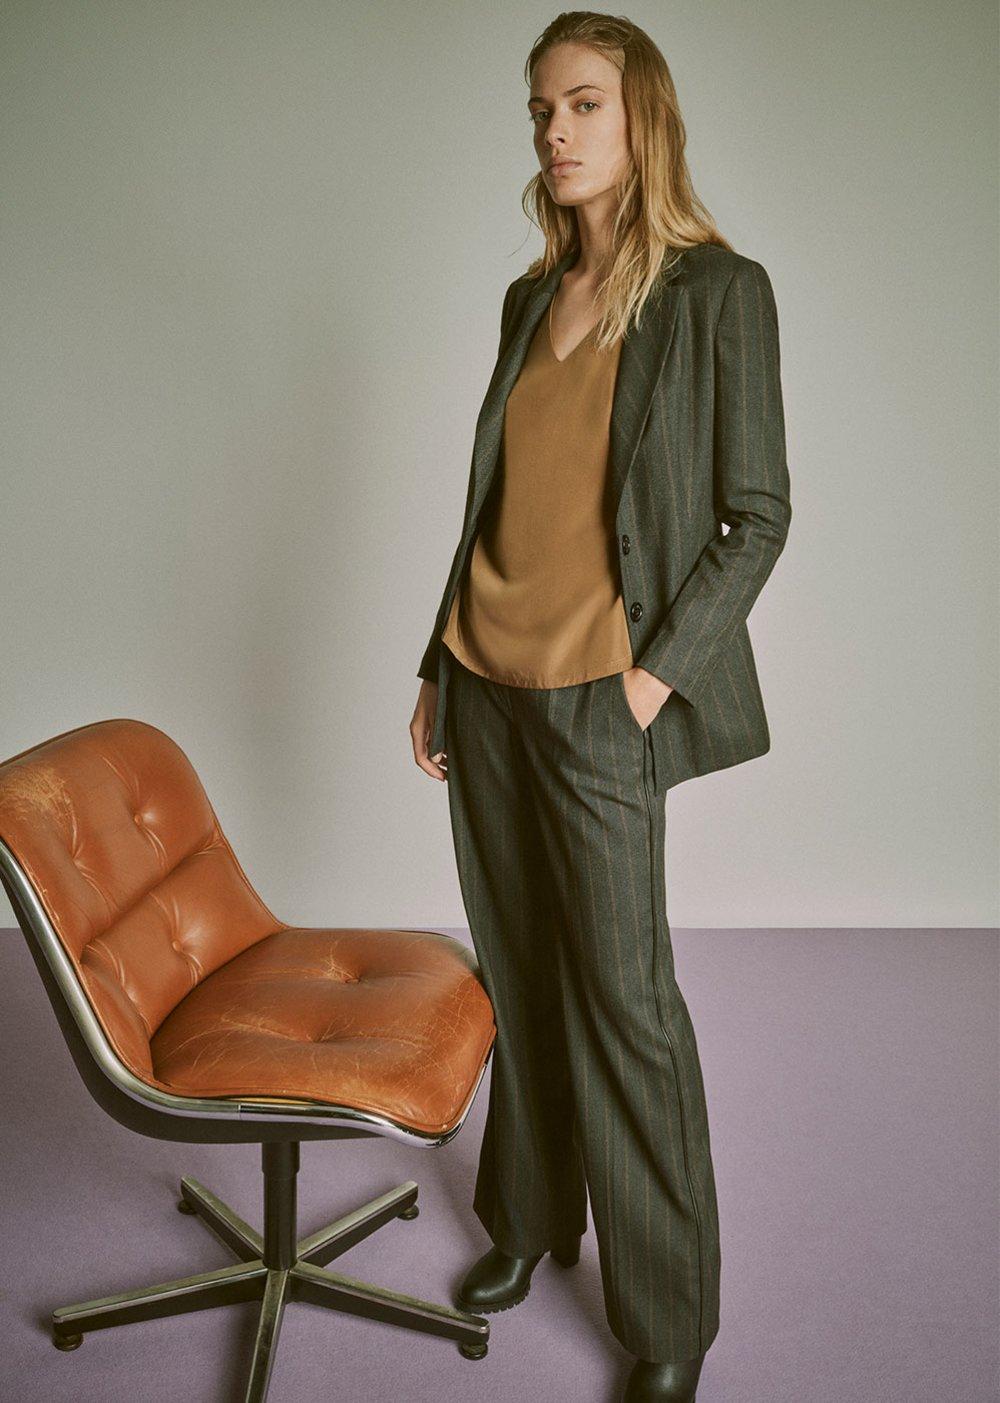 Ashley pinstripe trousers - Grey M.\Cacao Stripes - Woman